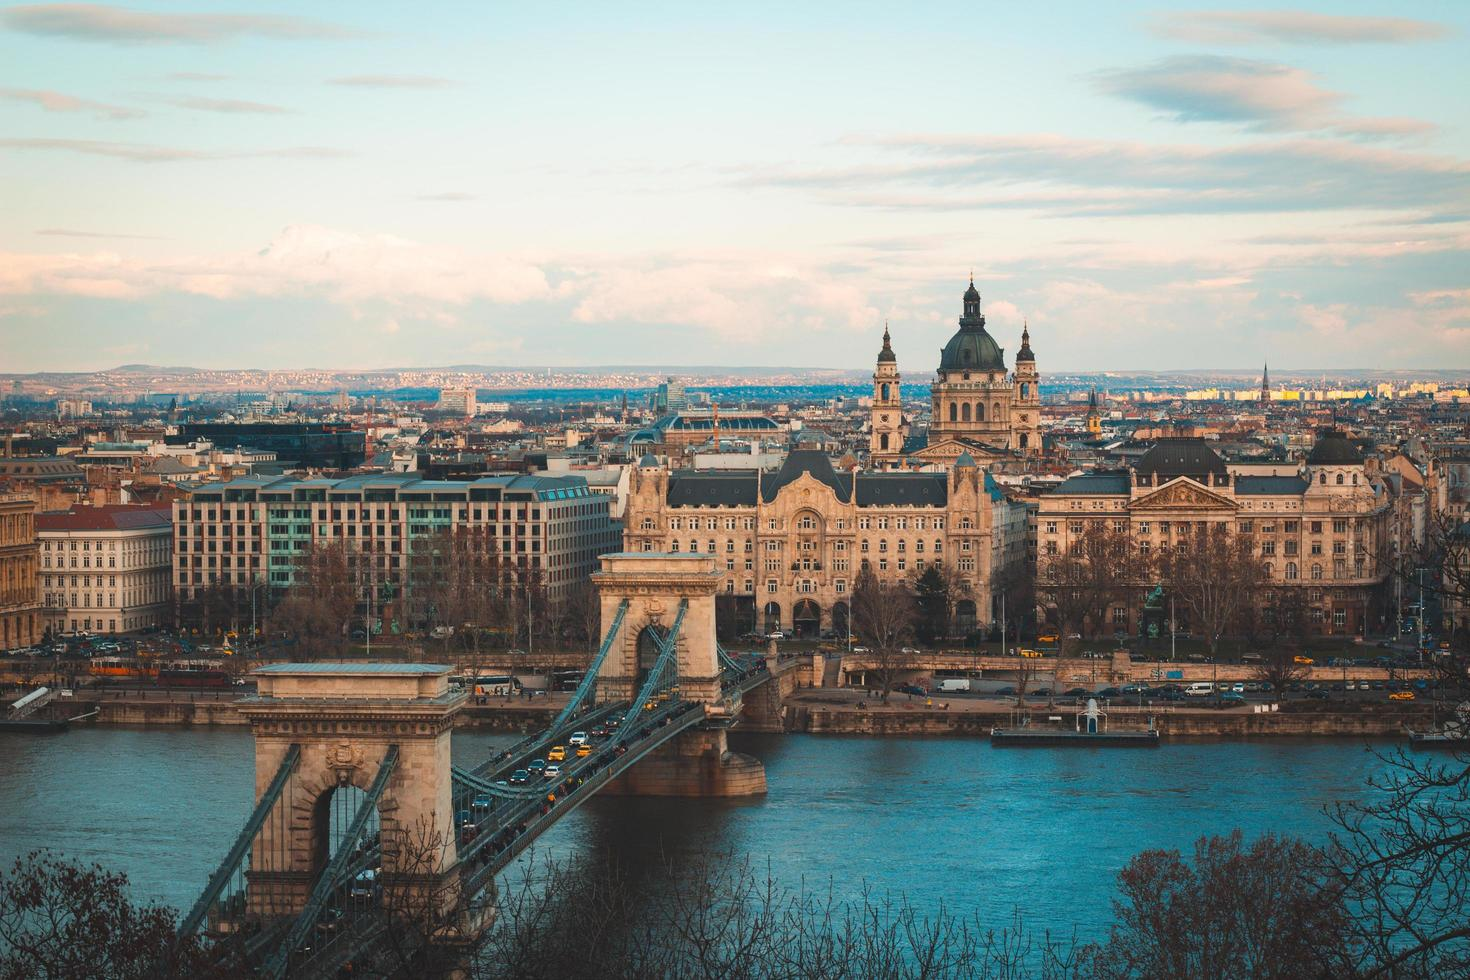 braune Betonbrücke über den Fluss foto